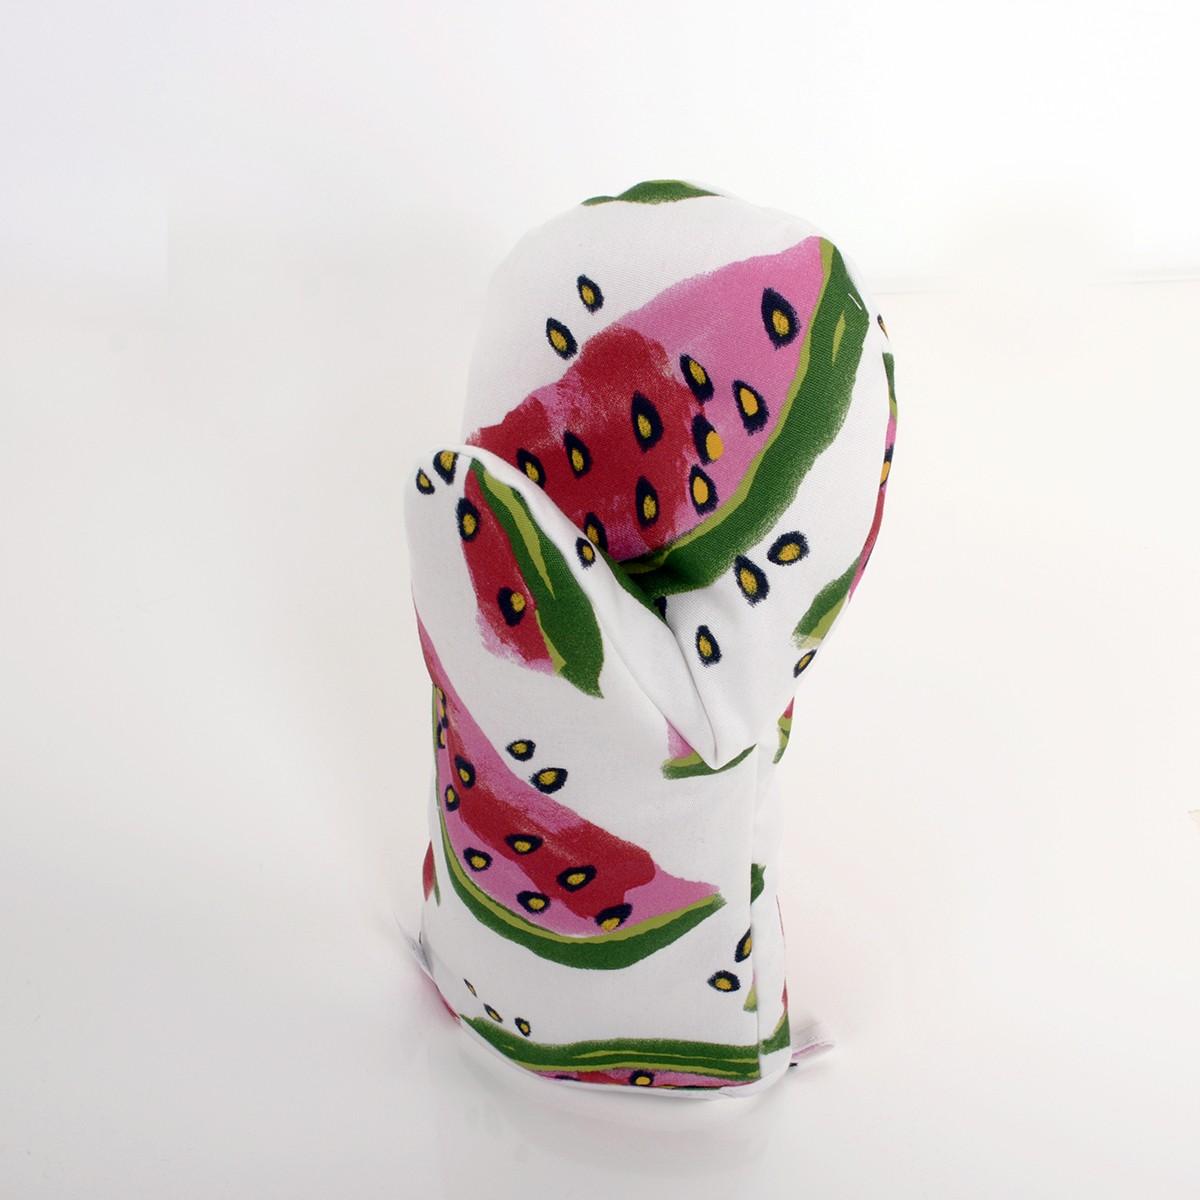 Watermelon - Oven mitt